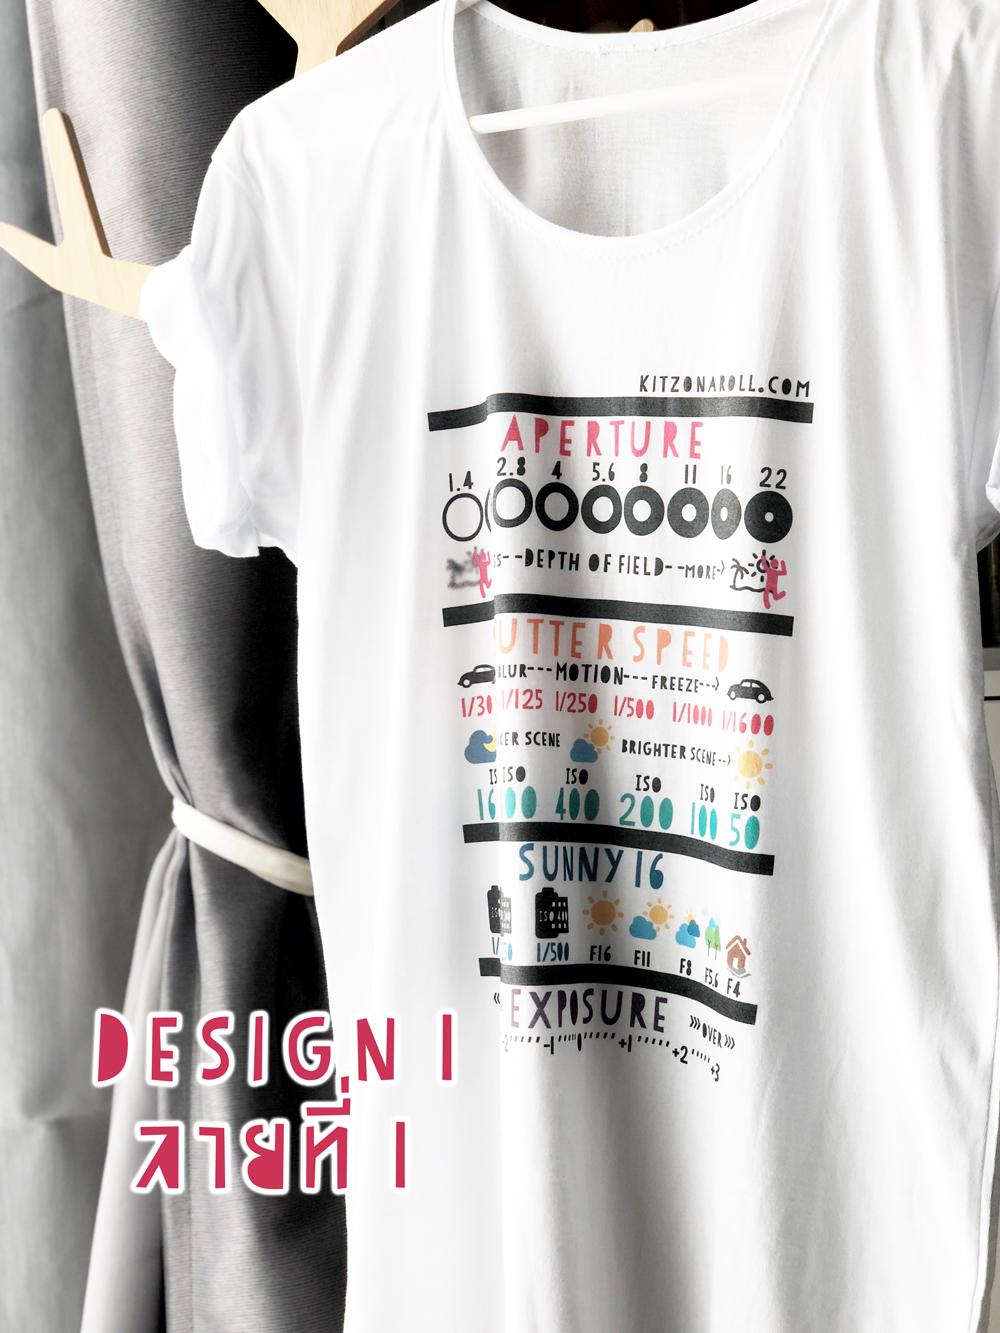 ShopSign-TShirt-Design1.jpg